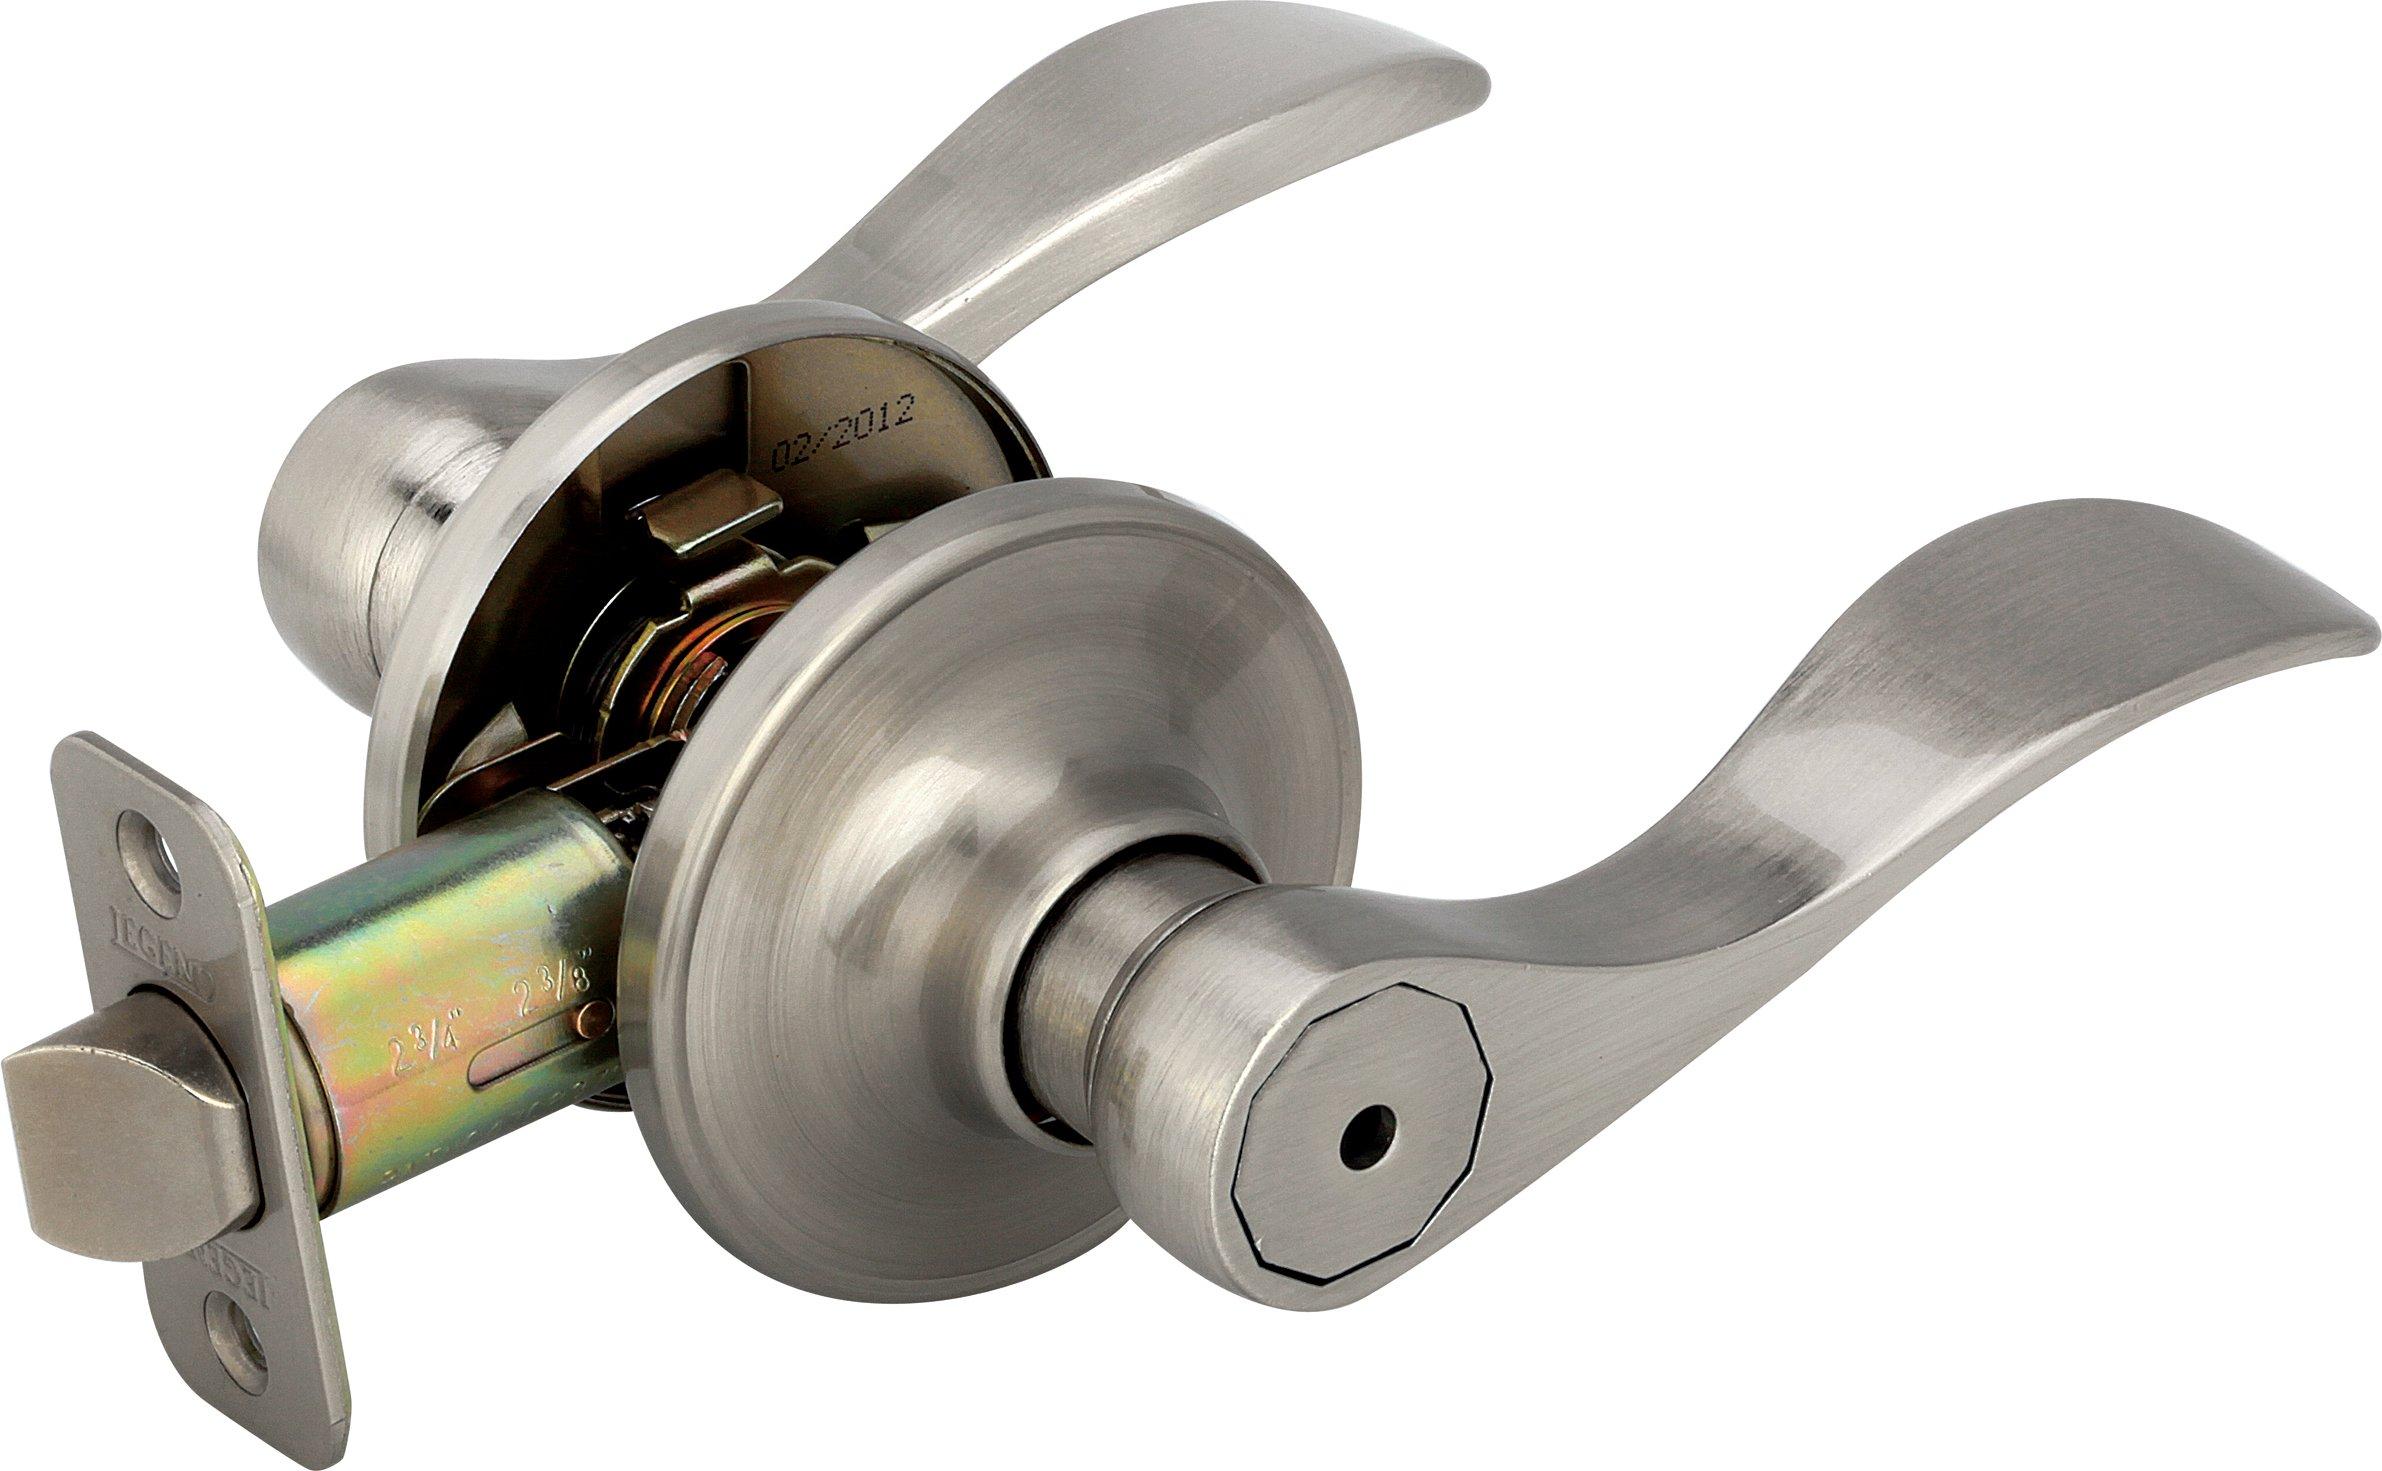 Legend 809121 US15 Lever Handle Privacy Locket, Satin Nickel Finish